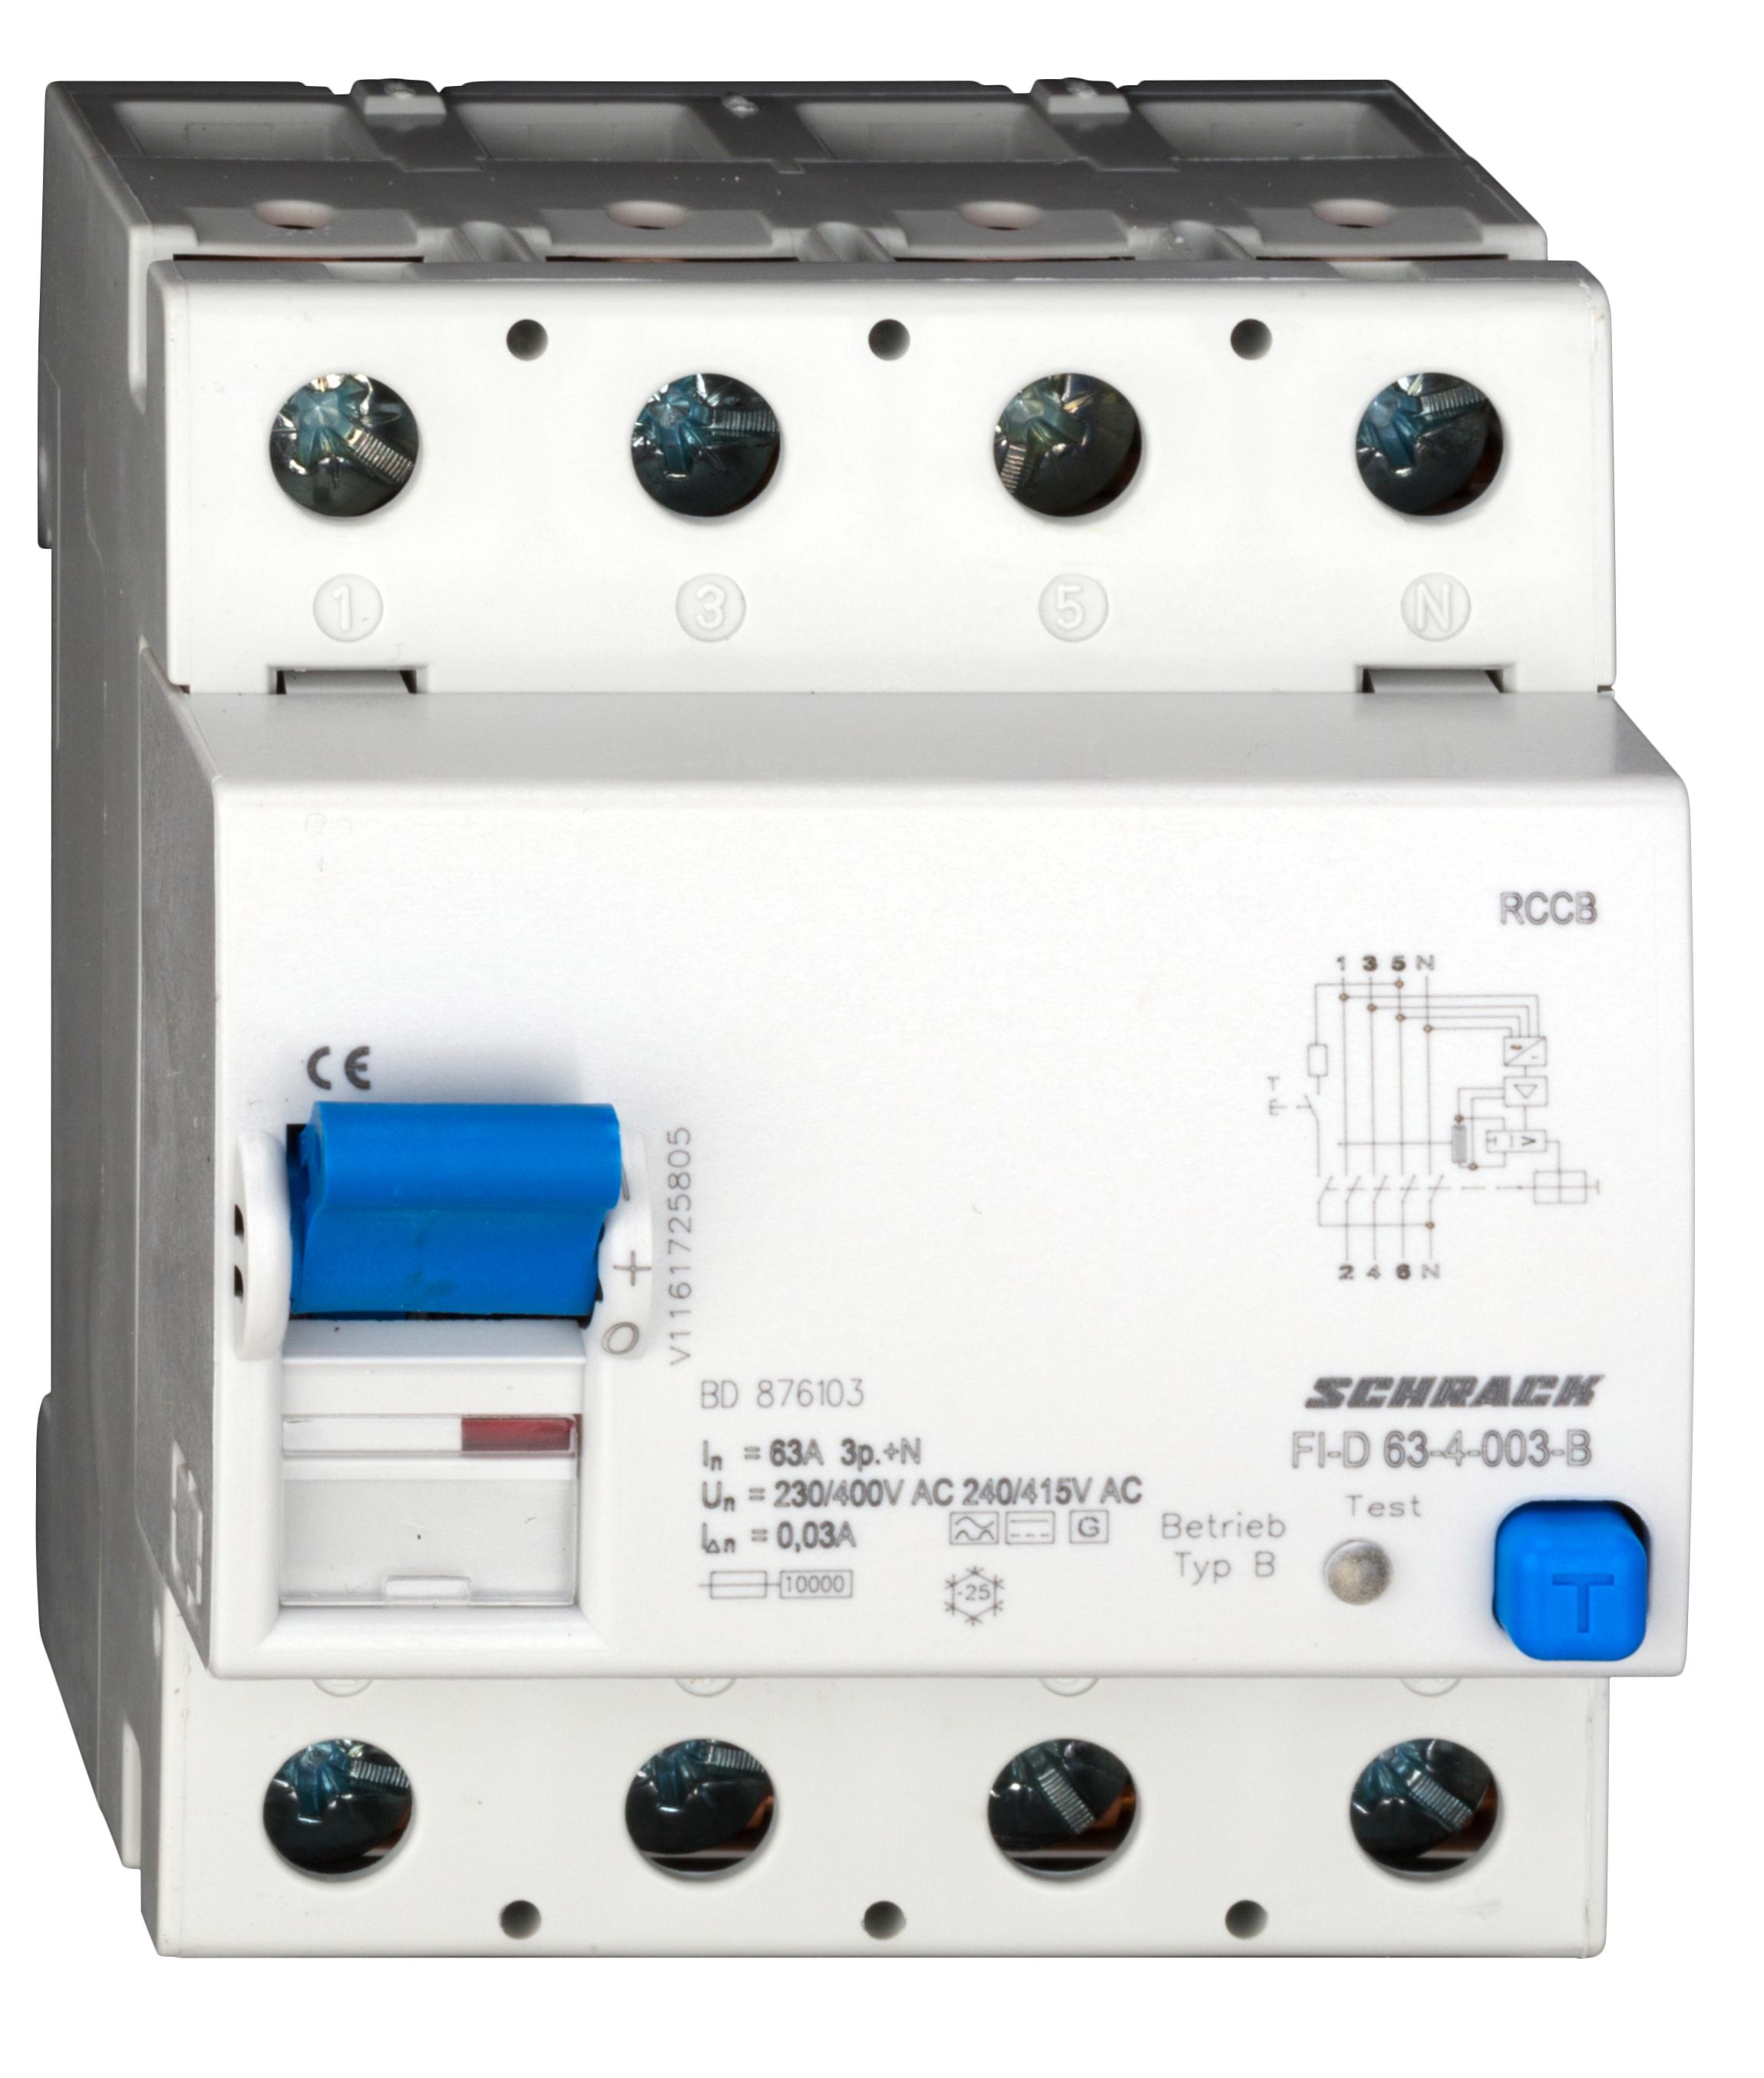 1 Stk Allstromsensitiver FI-Schalter 63A, 4-polig, 30mA, Typ Bfq,G BD876103--